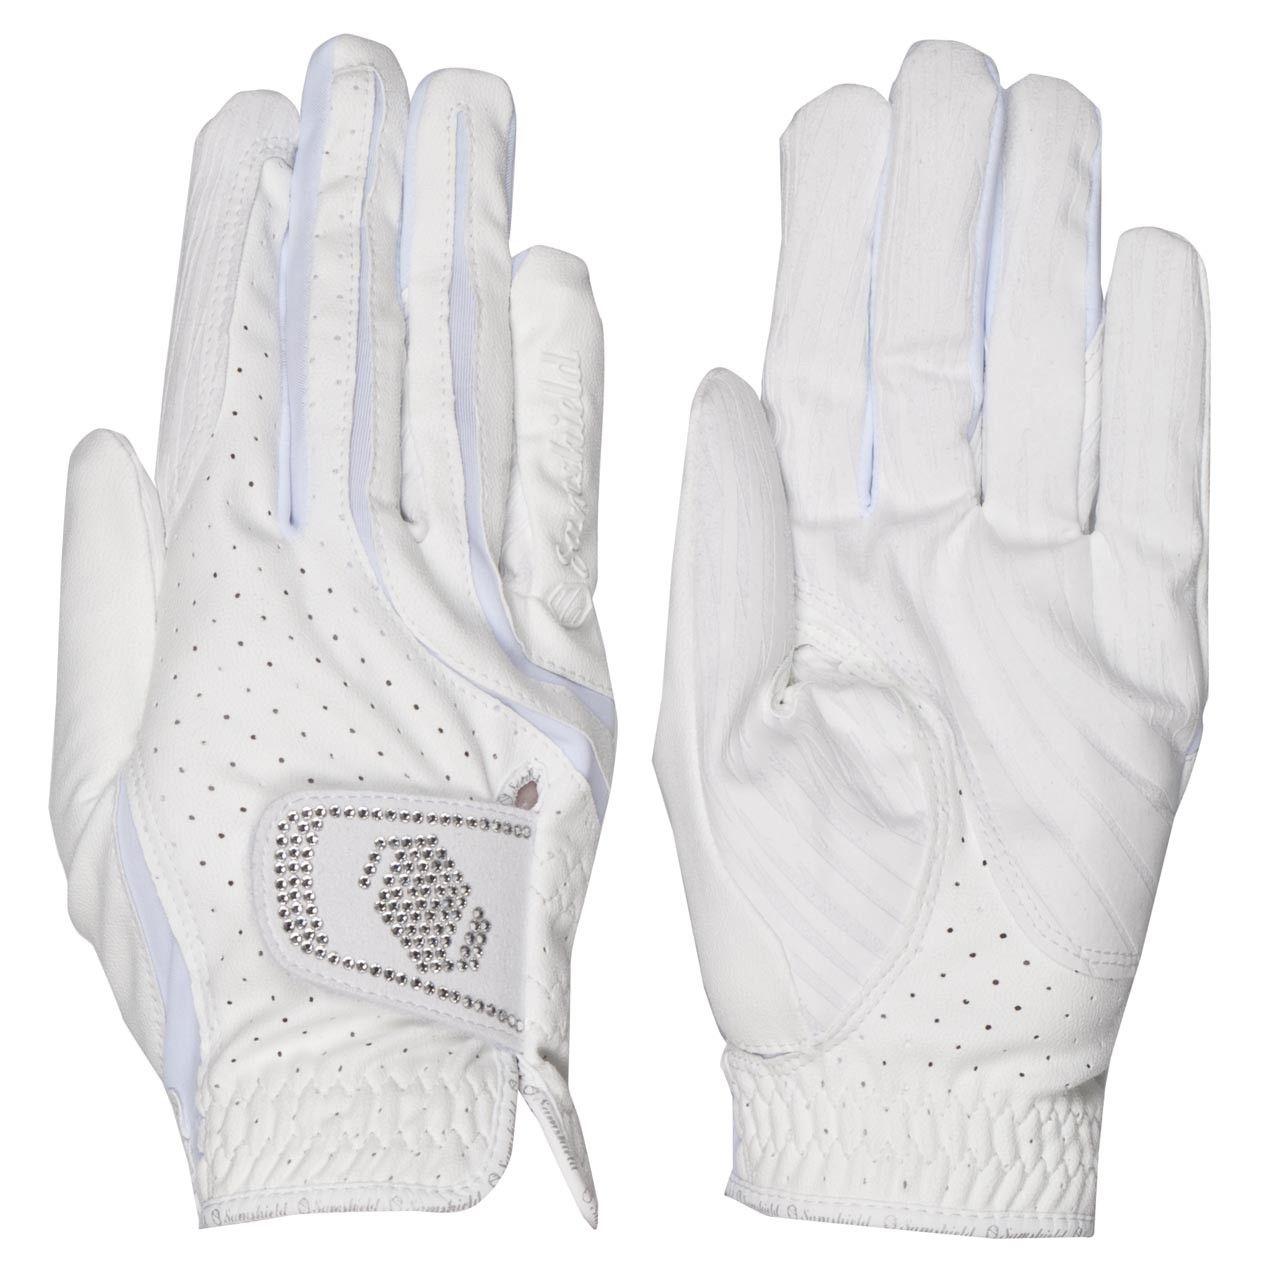 Samshield handschoenen Swarovski wit maat:6